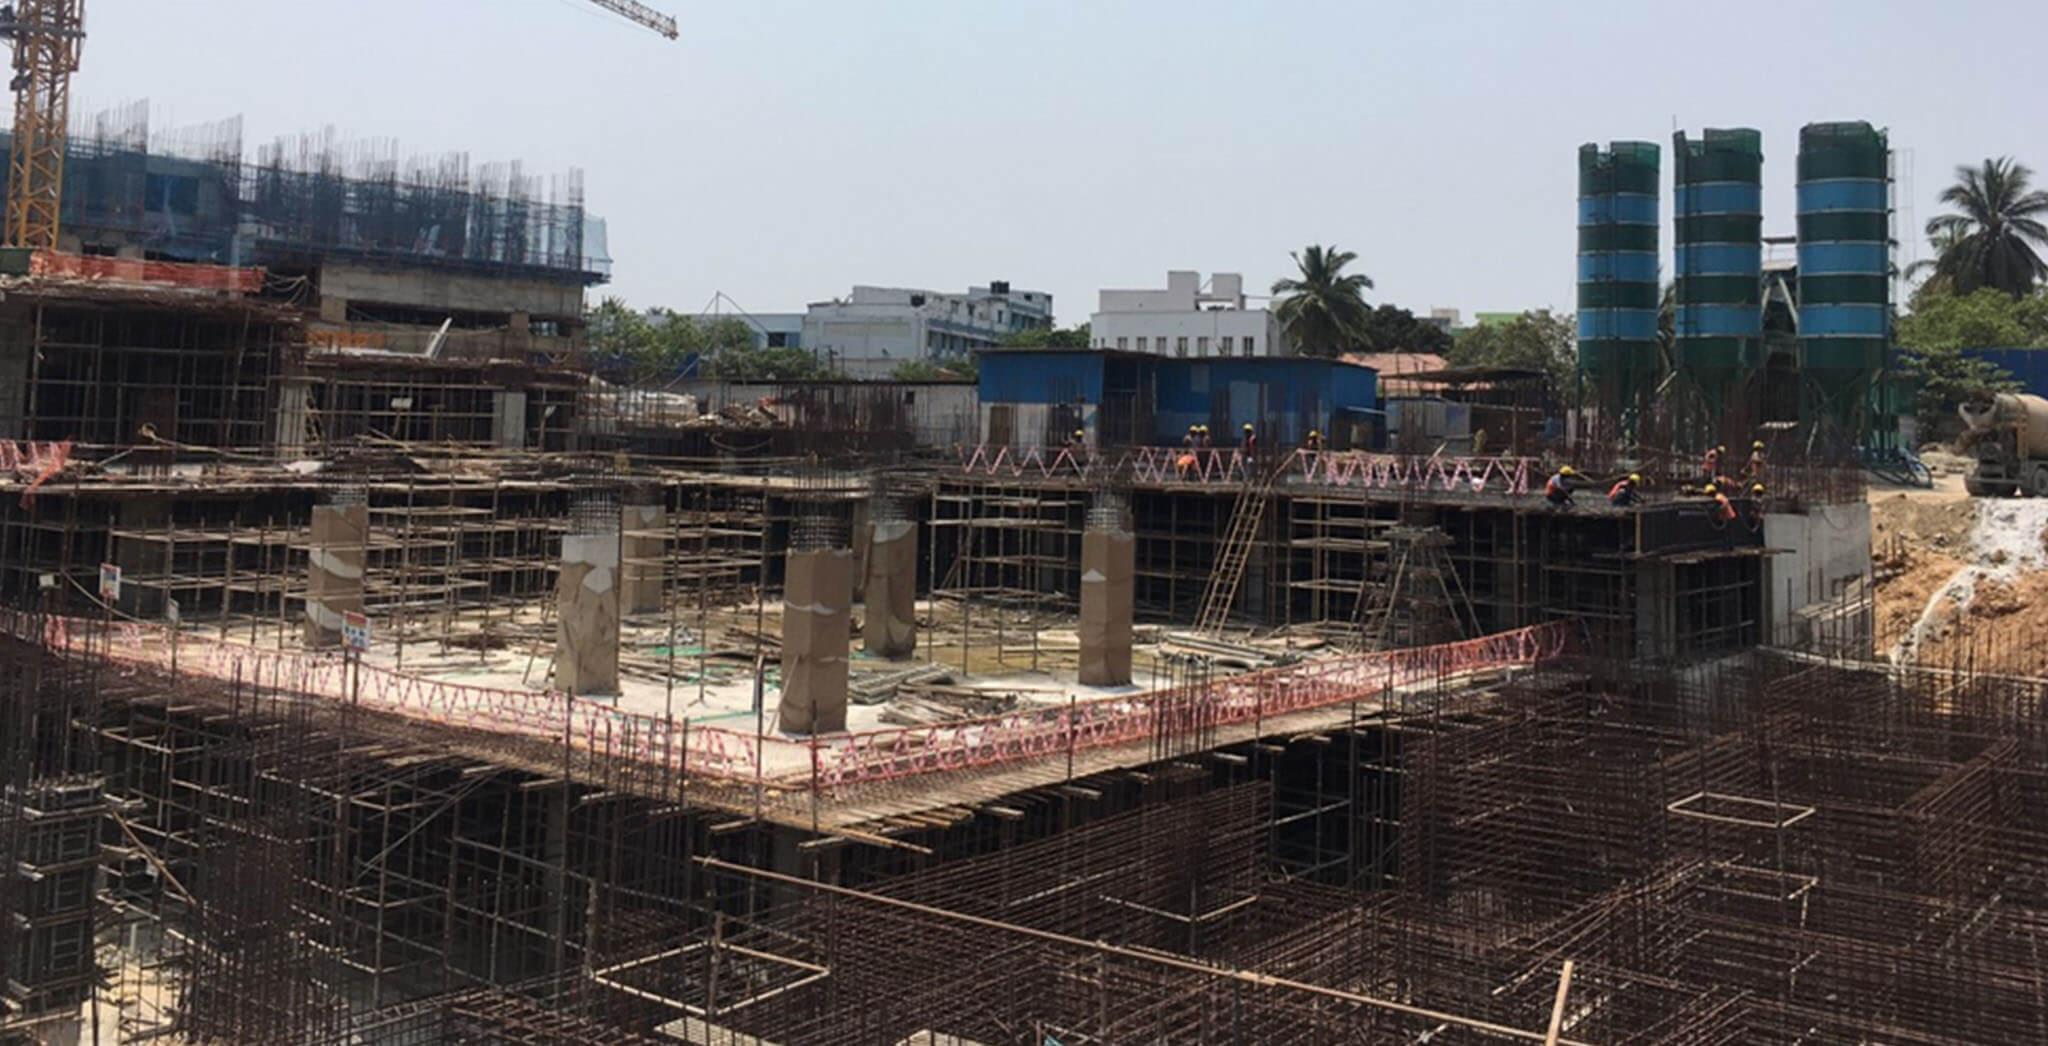 Mar 2021 - Non Tower: Basement 1 level slab work-in-progress